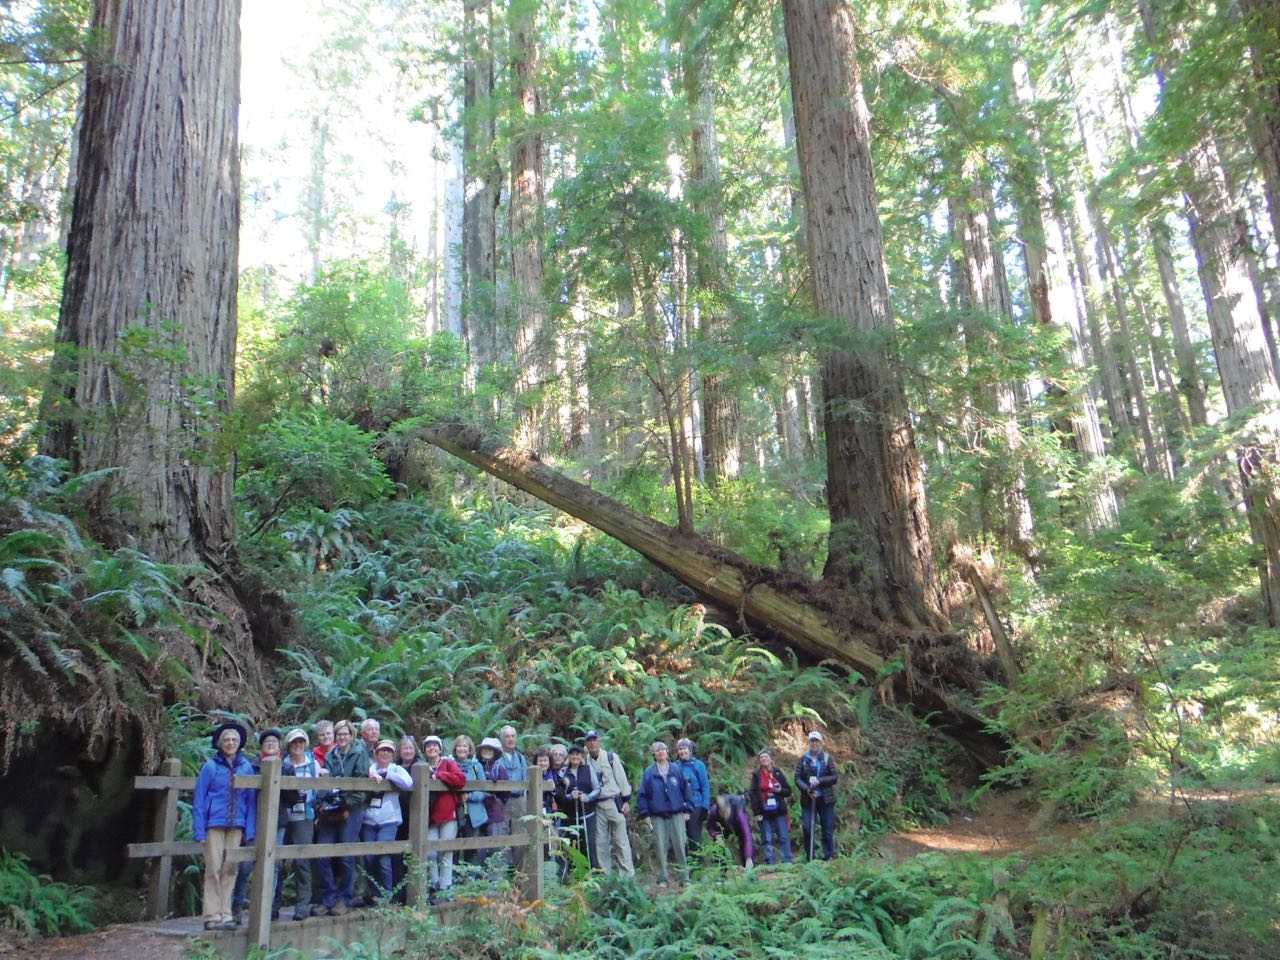 Redwoods 2017 10 08 230 Of 287